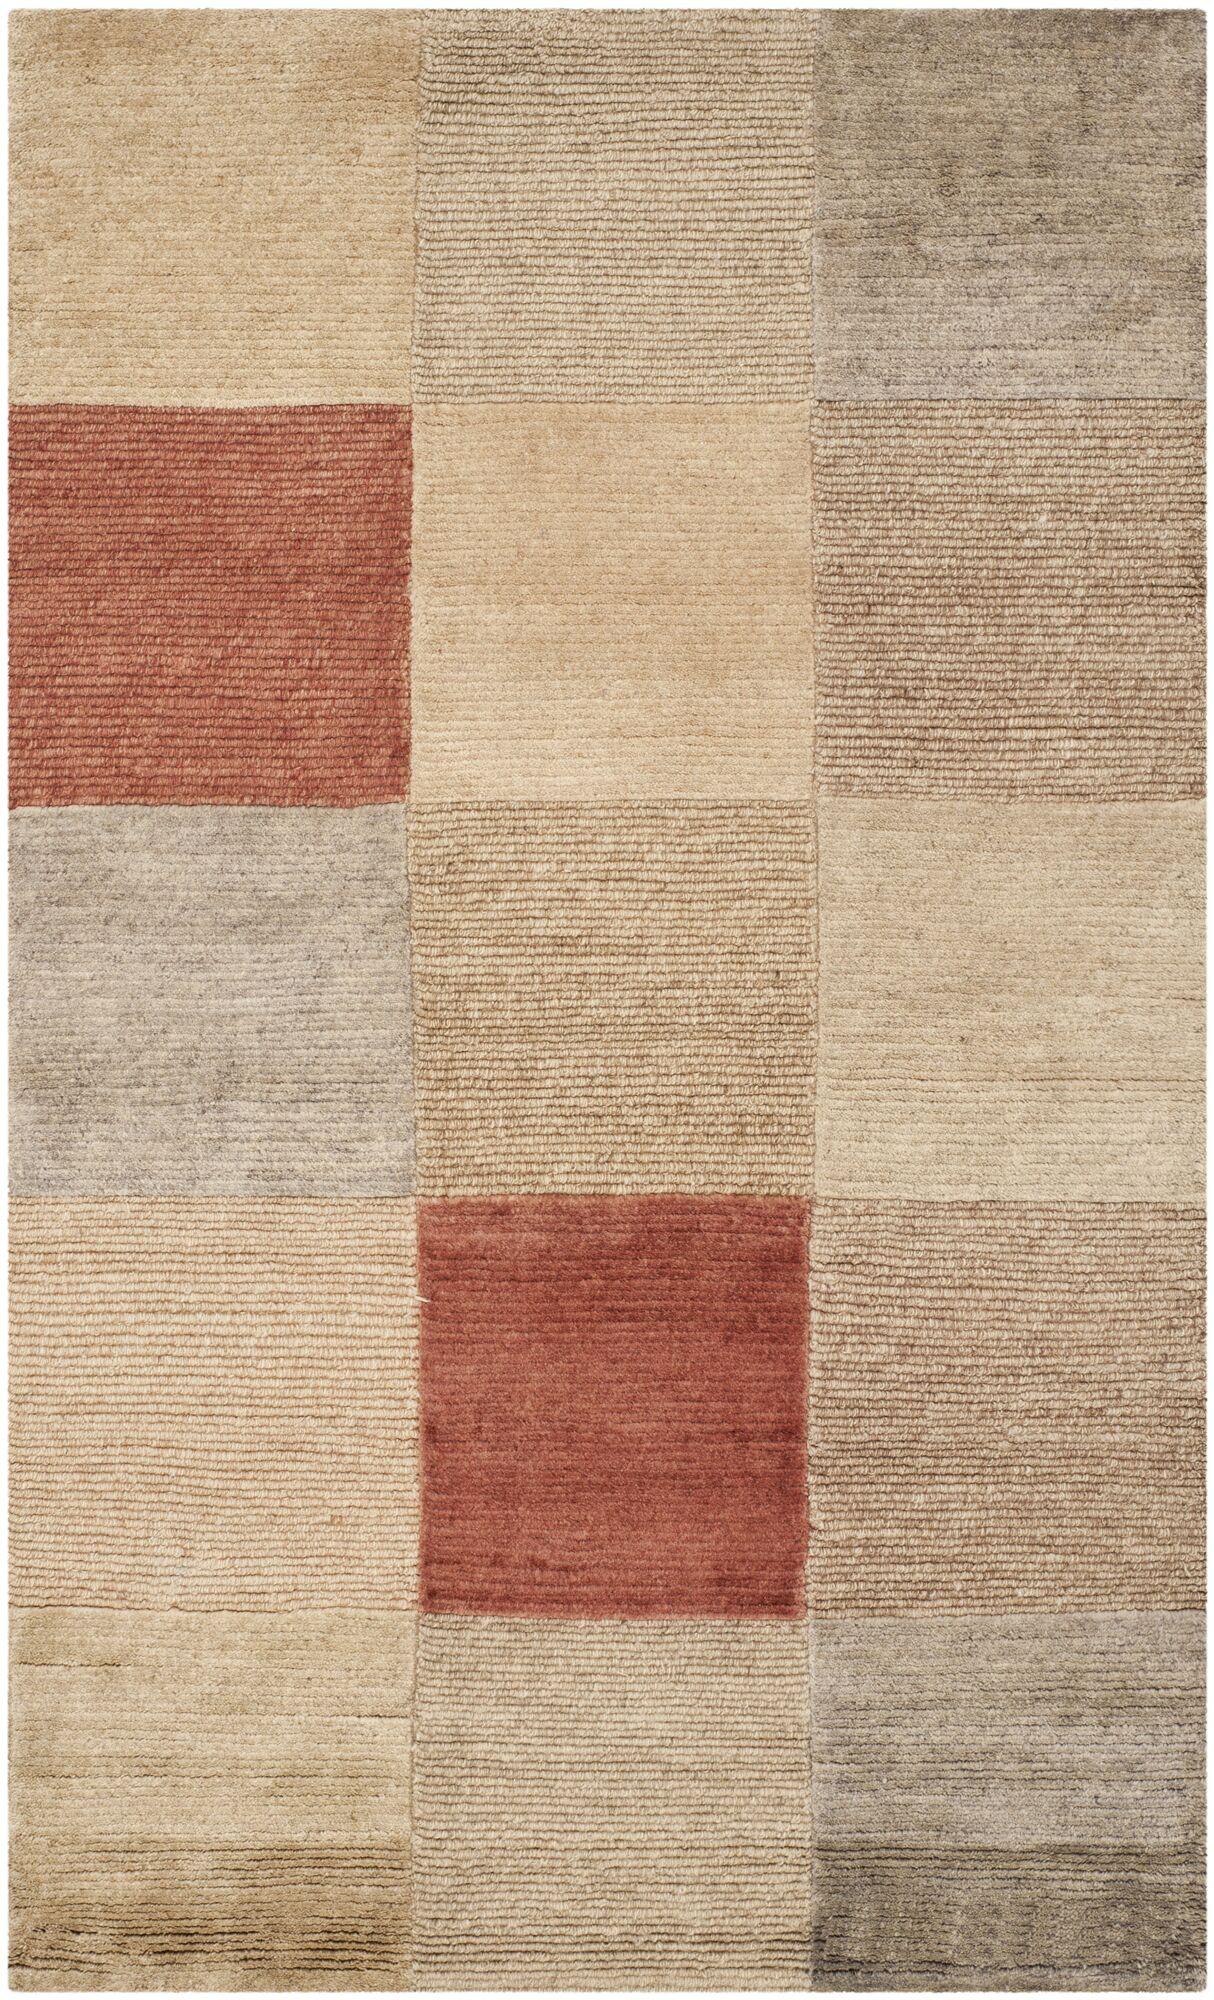 Bernick Tibetan Hand Knotted Beige/Gray Area Rug Rug Size: Rectangle 5' x 7'6